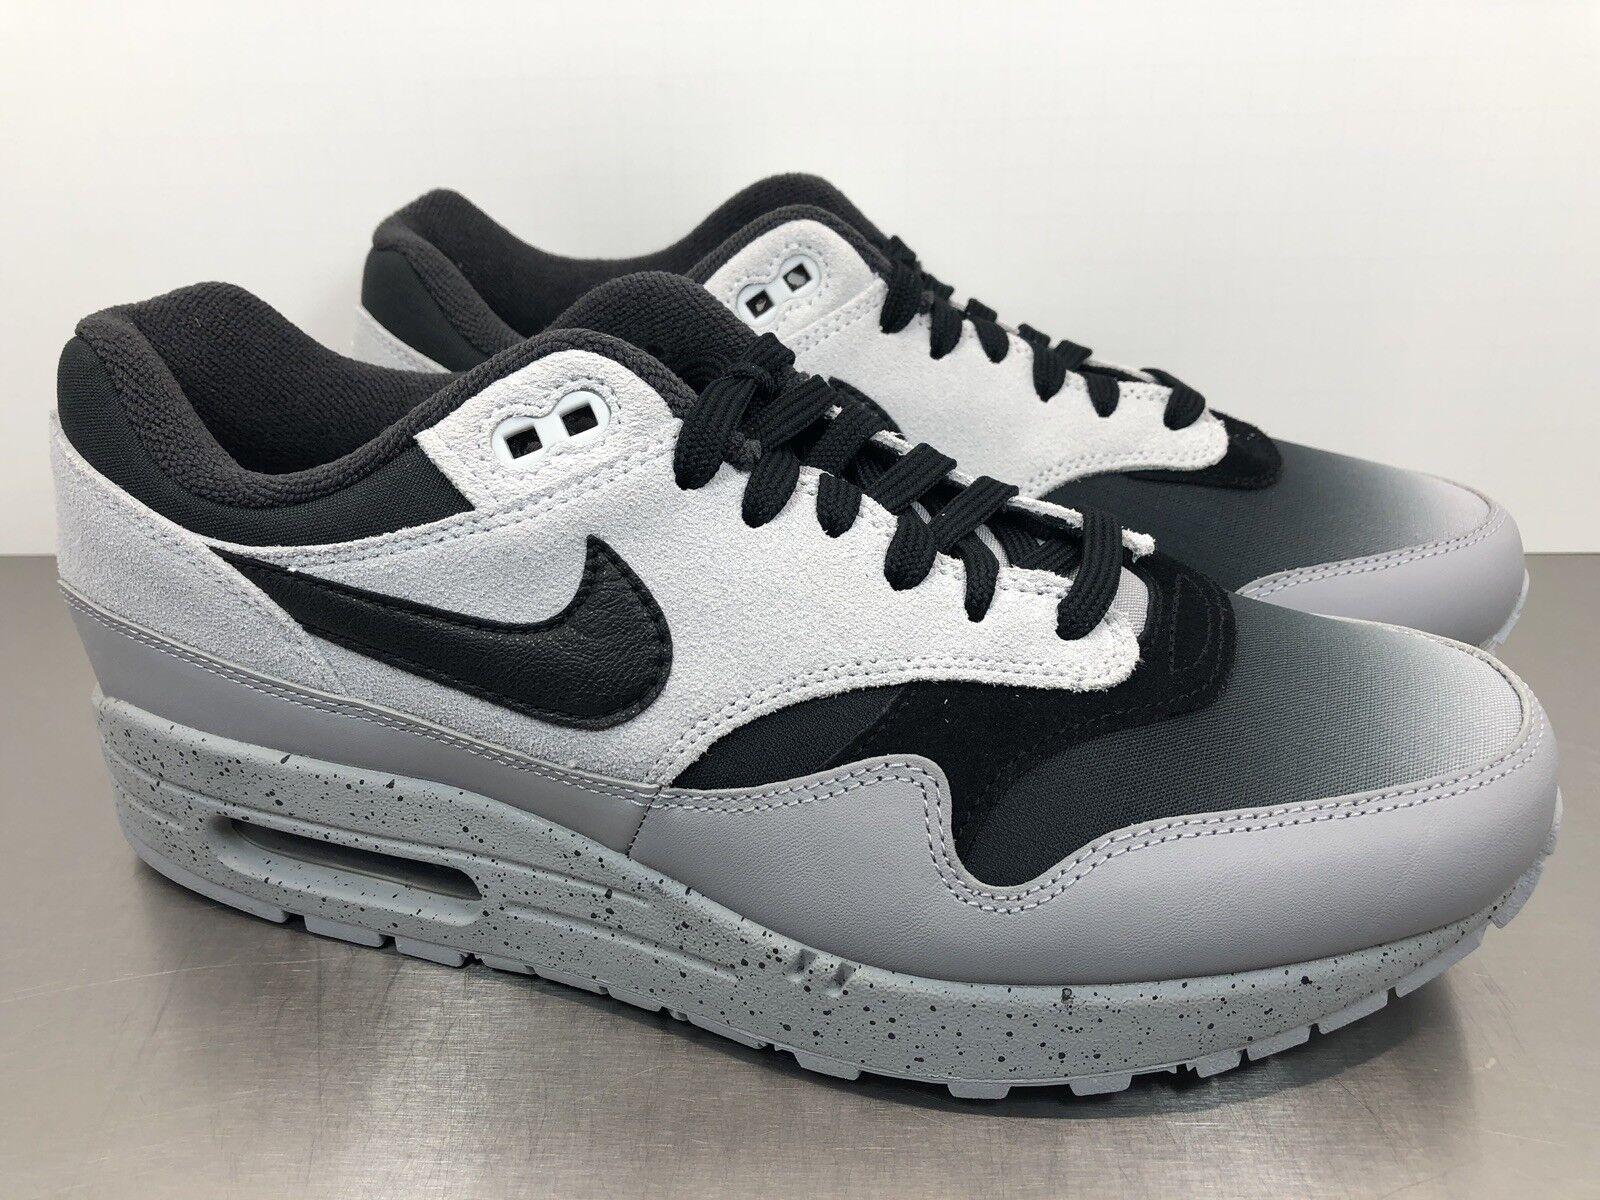 Nike Air Max 1 Premium Mens shoes Size 9 Platinum Black Wolf Grey 875844 003